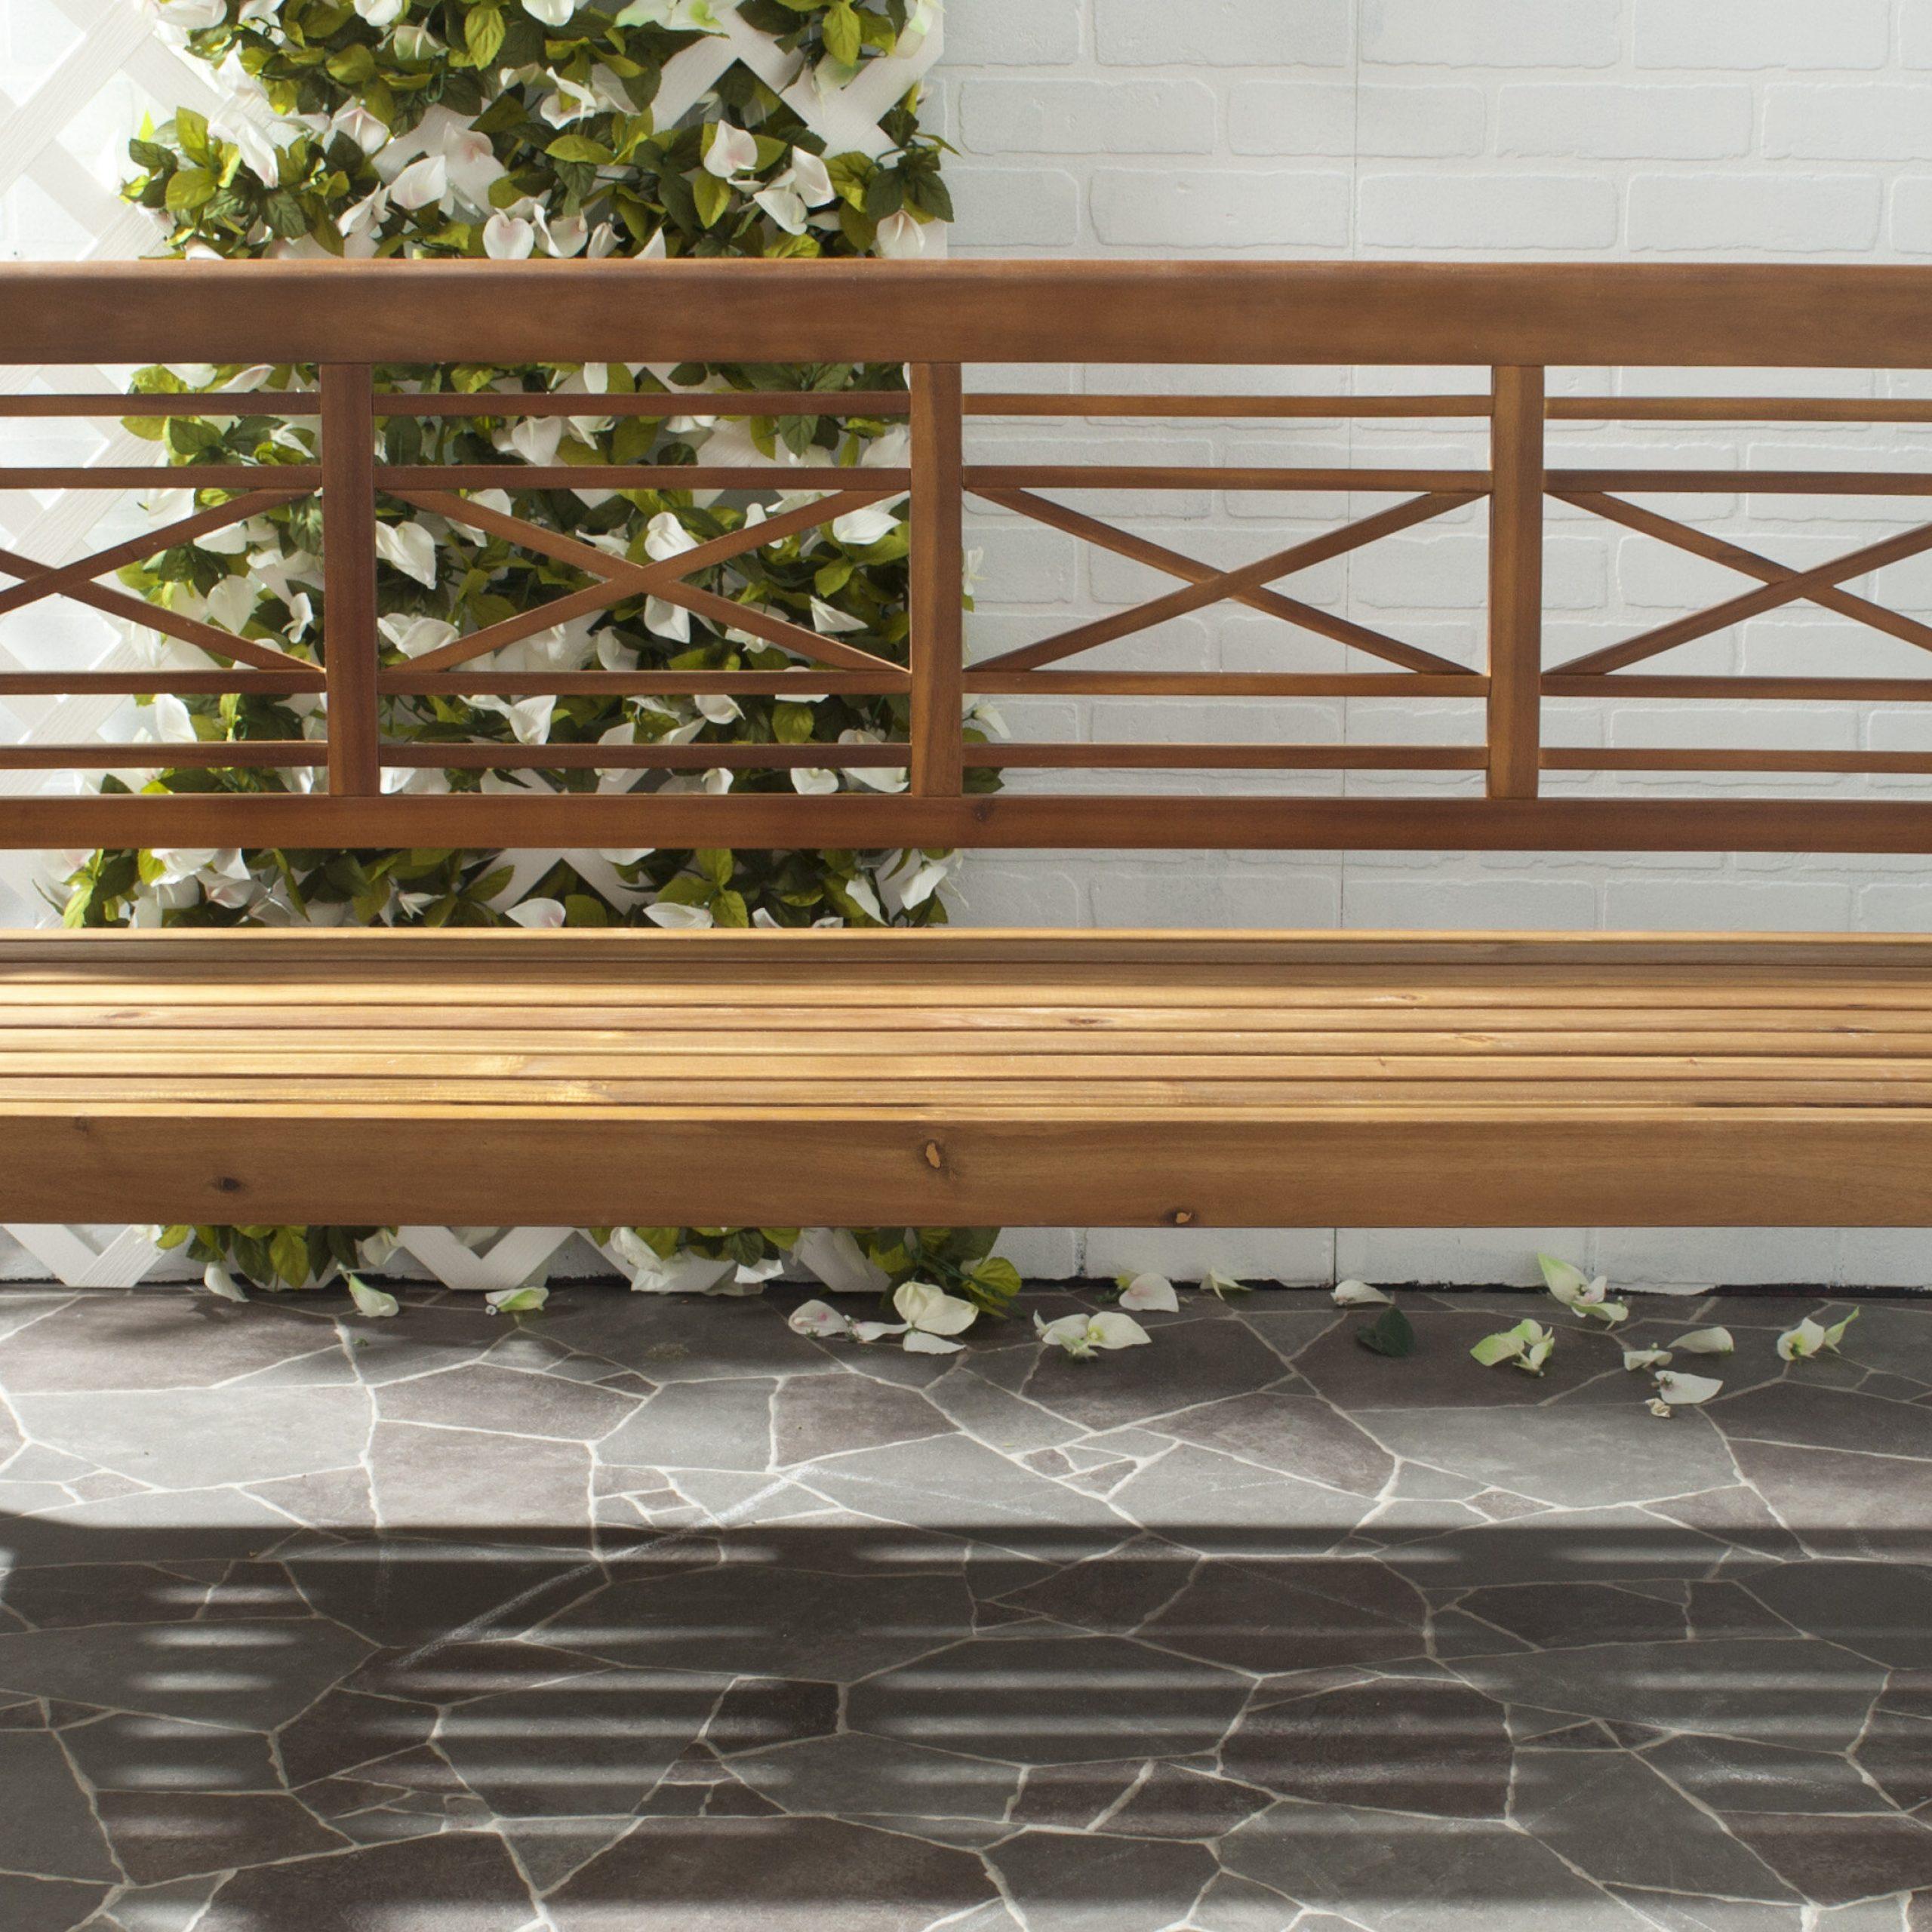 Putnam Wooden Garden Bench With Leora Wooden Garden Benches (View 10 of 25)